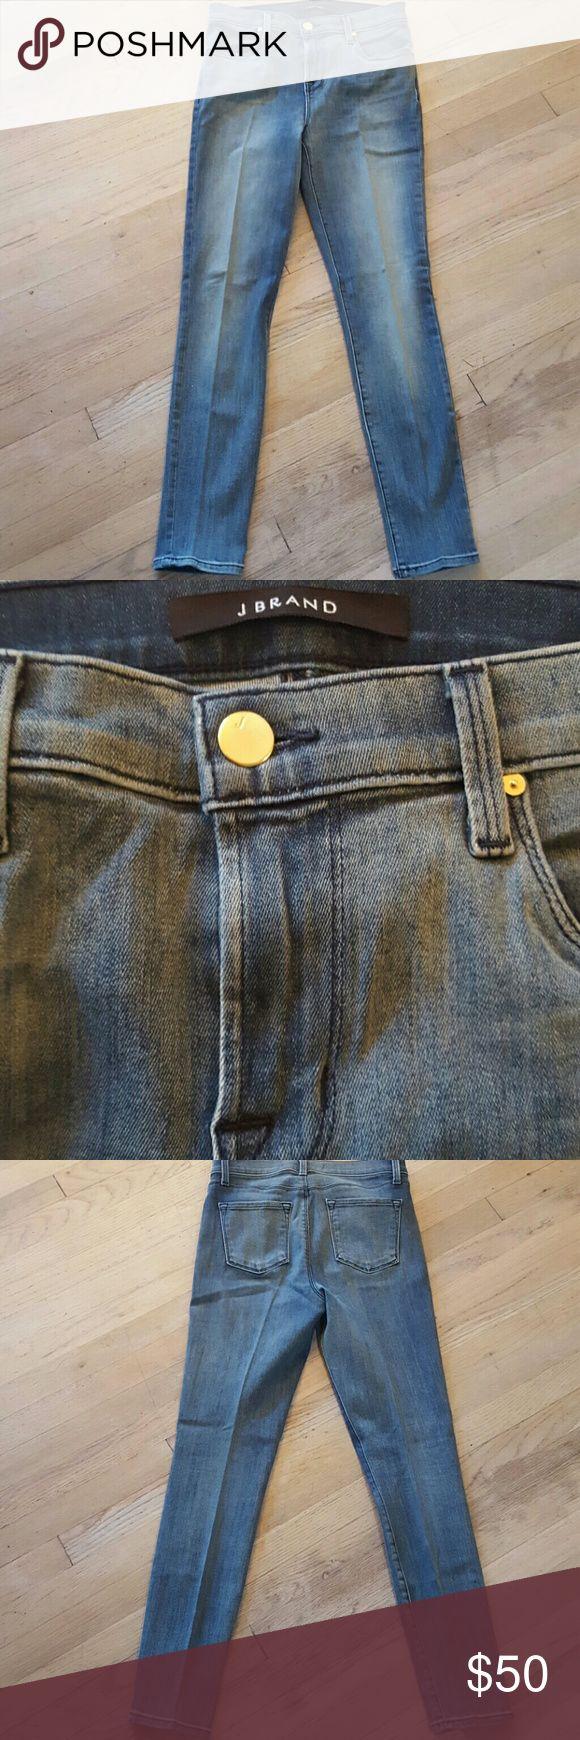 New withot tags Jbrand Skinny Jeans Light Wash und Light Denim Skinny Jeans mit …   – My Posh Picks